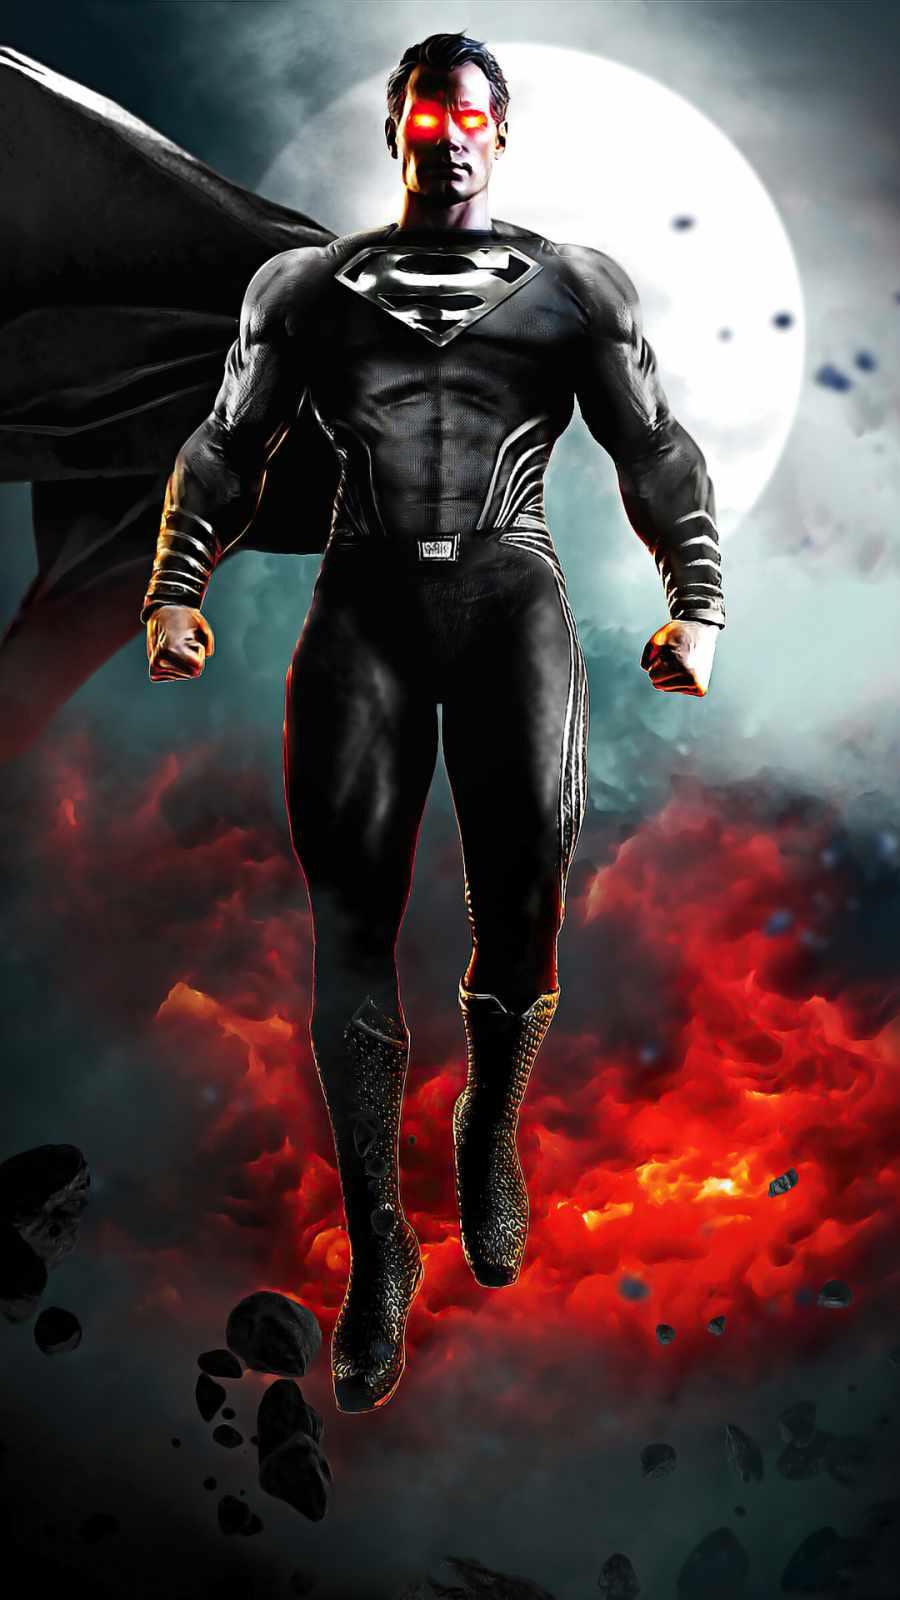 Zack synder justice league black suit superman